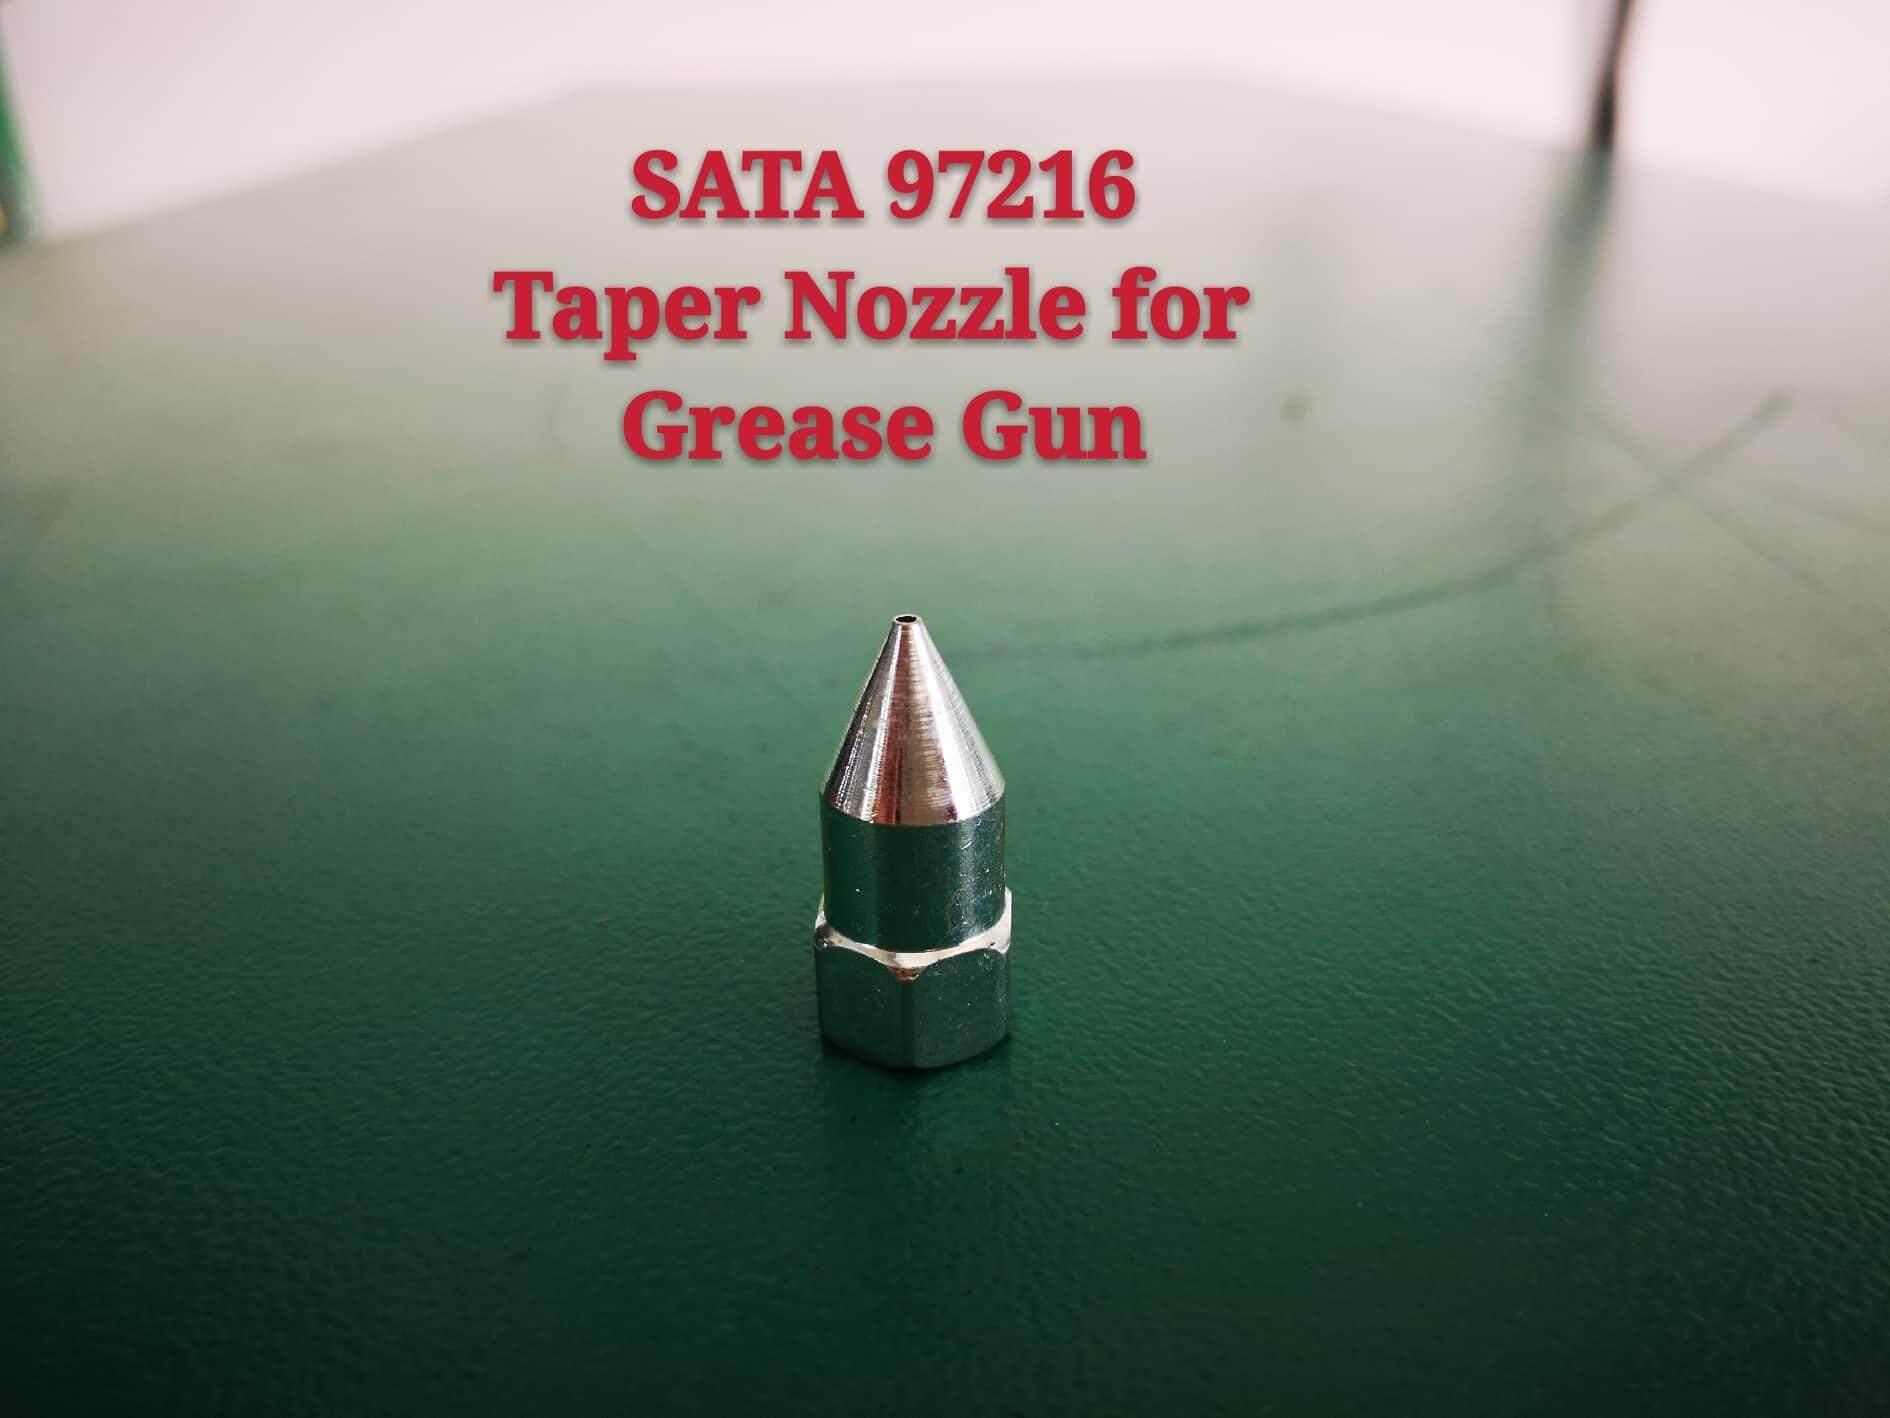 SATA Pistol Grip Grease Gun & Parts